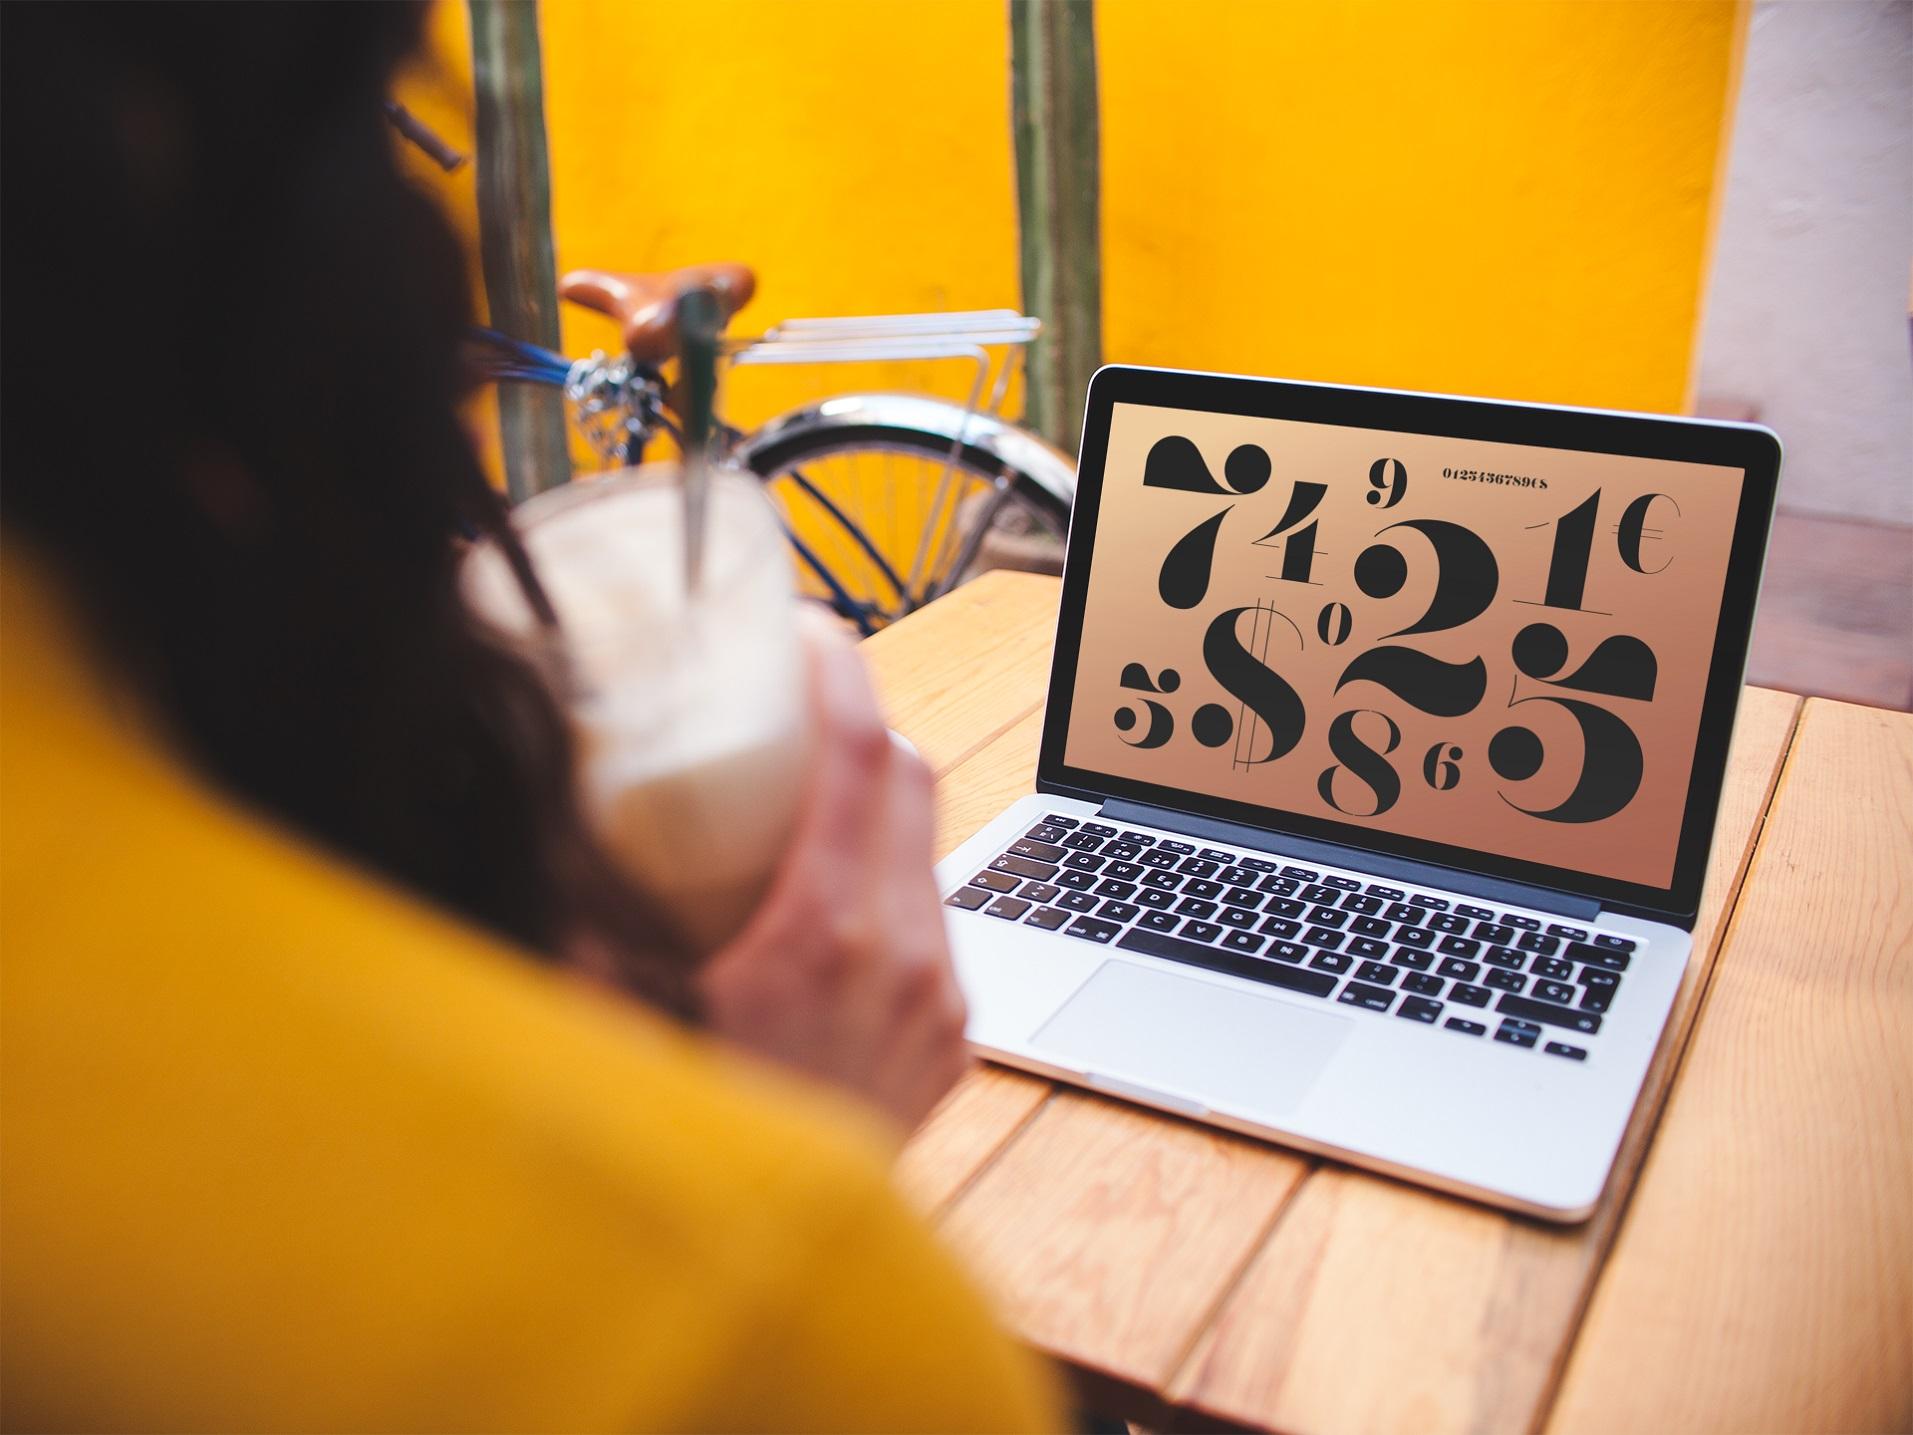 Hadirkan Kesan Formal dan Profesional dengan Font Serif